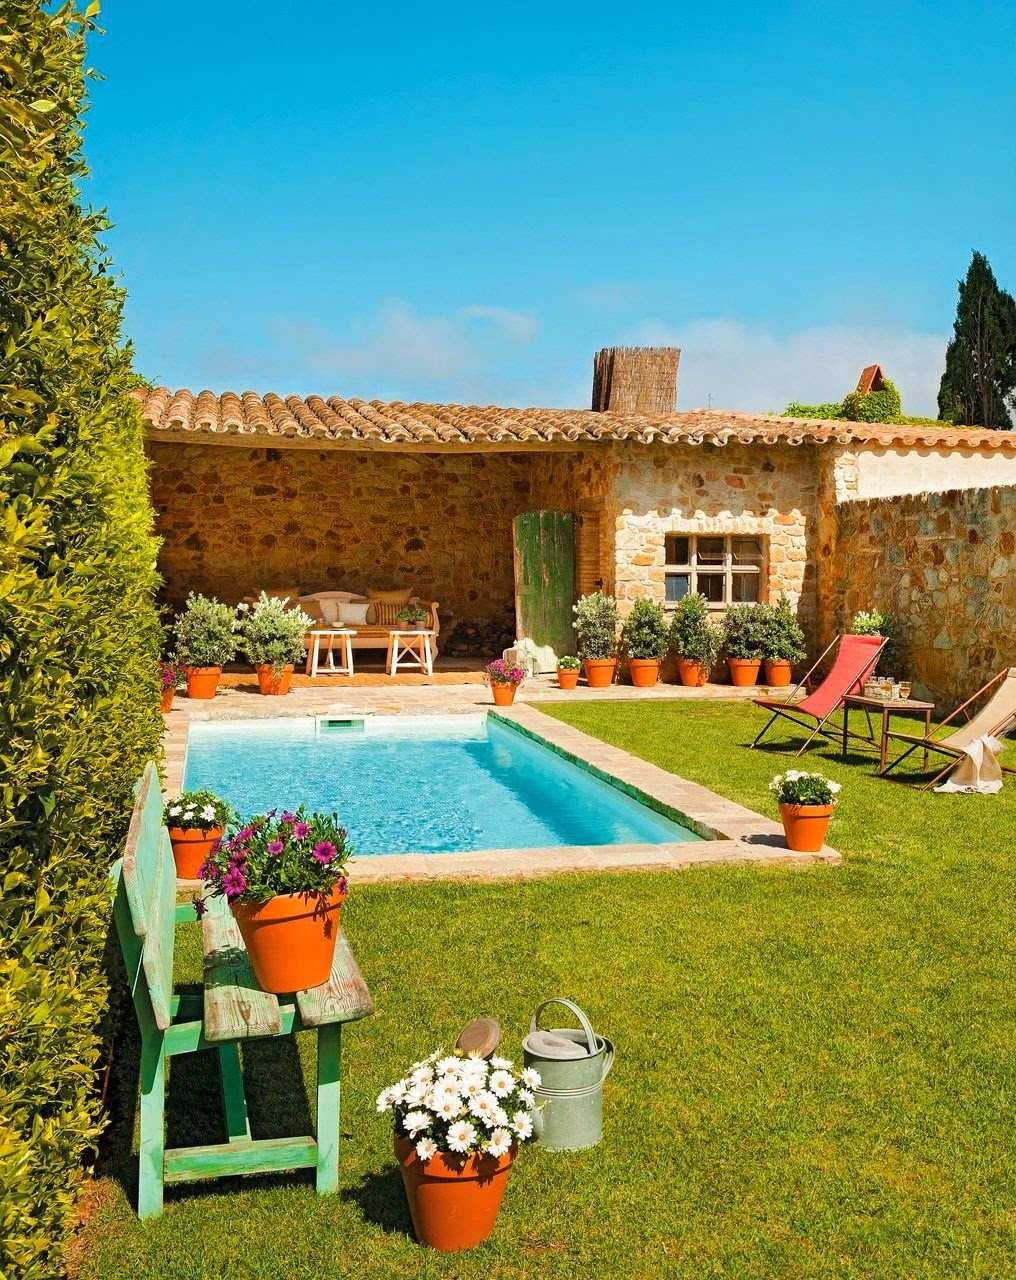 Casas lindas conhe a 65 casas incr veis e se inspire for Piscina y jardin 2002 s l